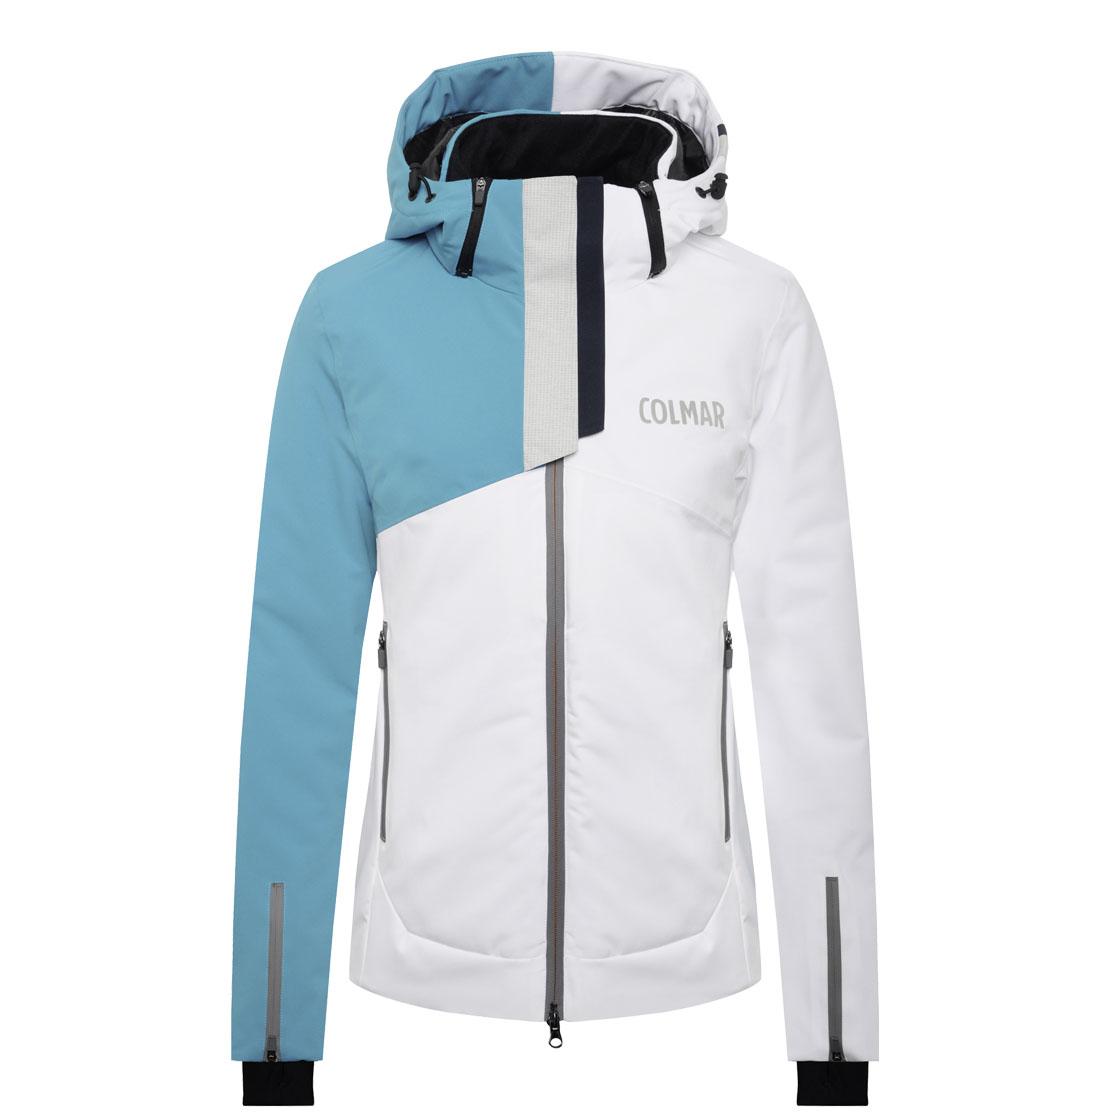 Colmar: Bormio Jacket 17/18 (Women)